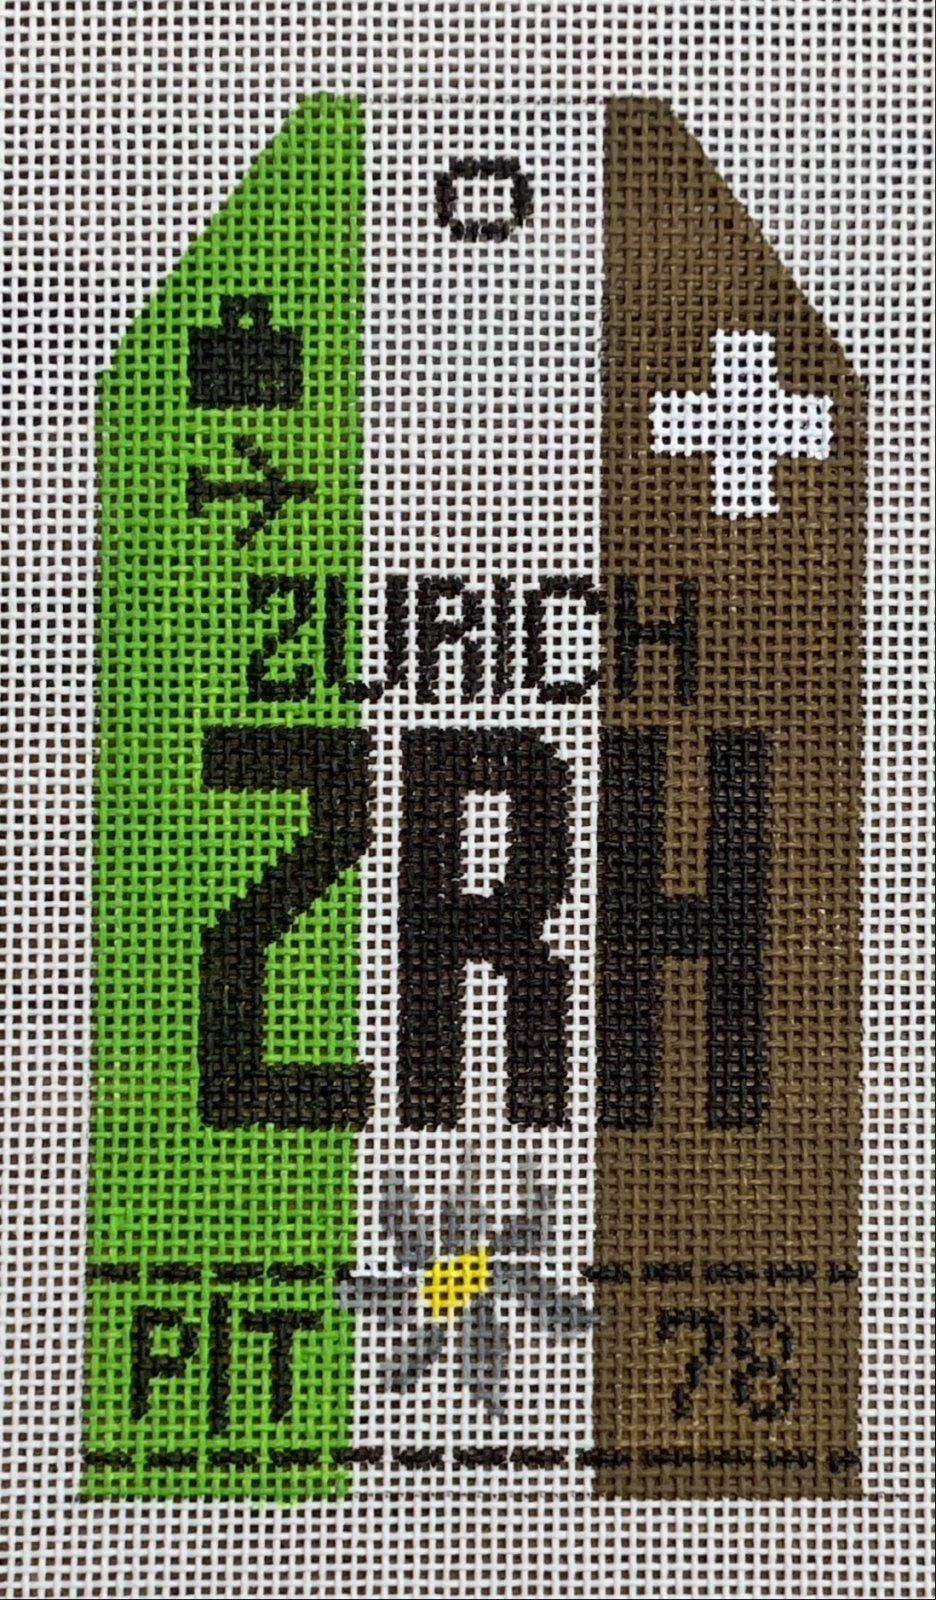 Vintage Luggage Tag - Zurich